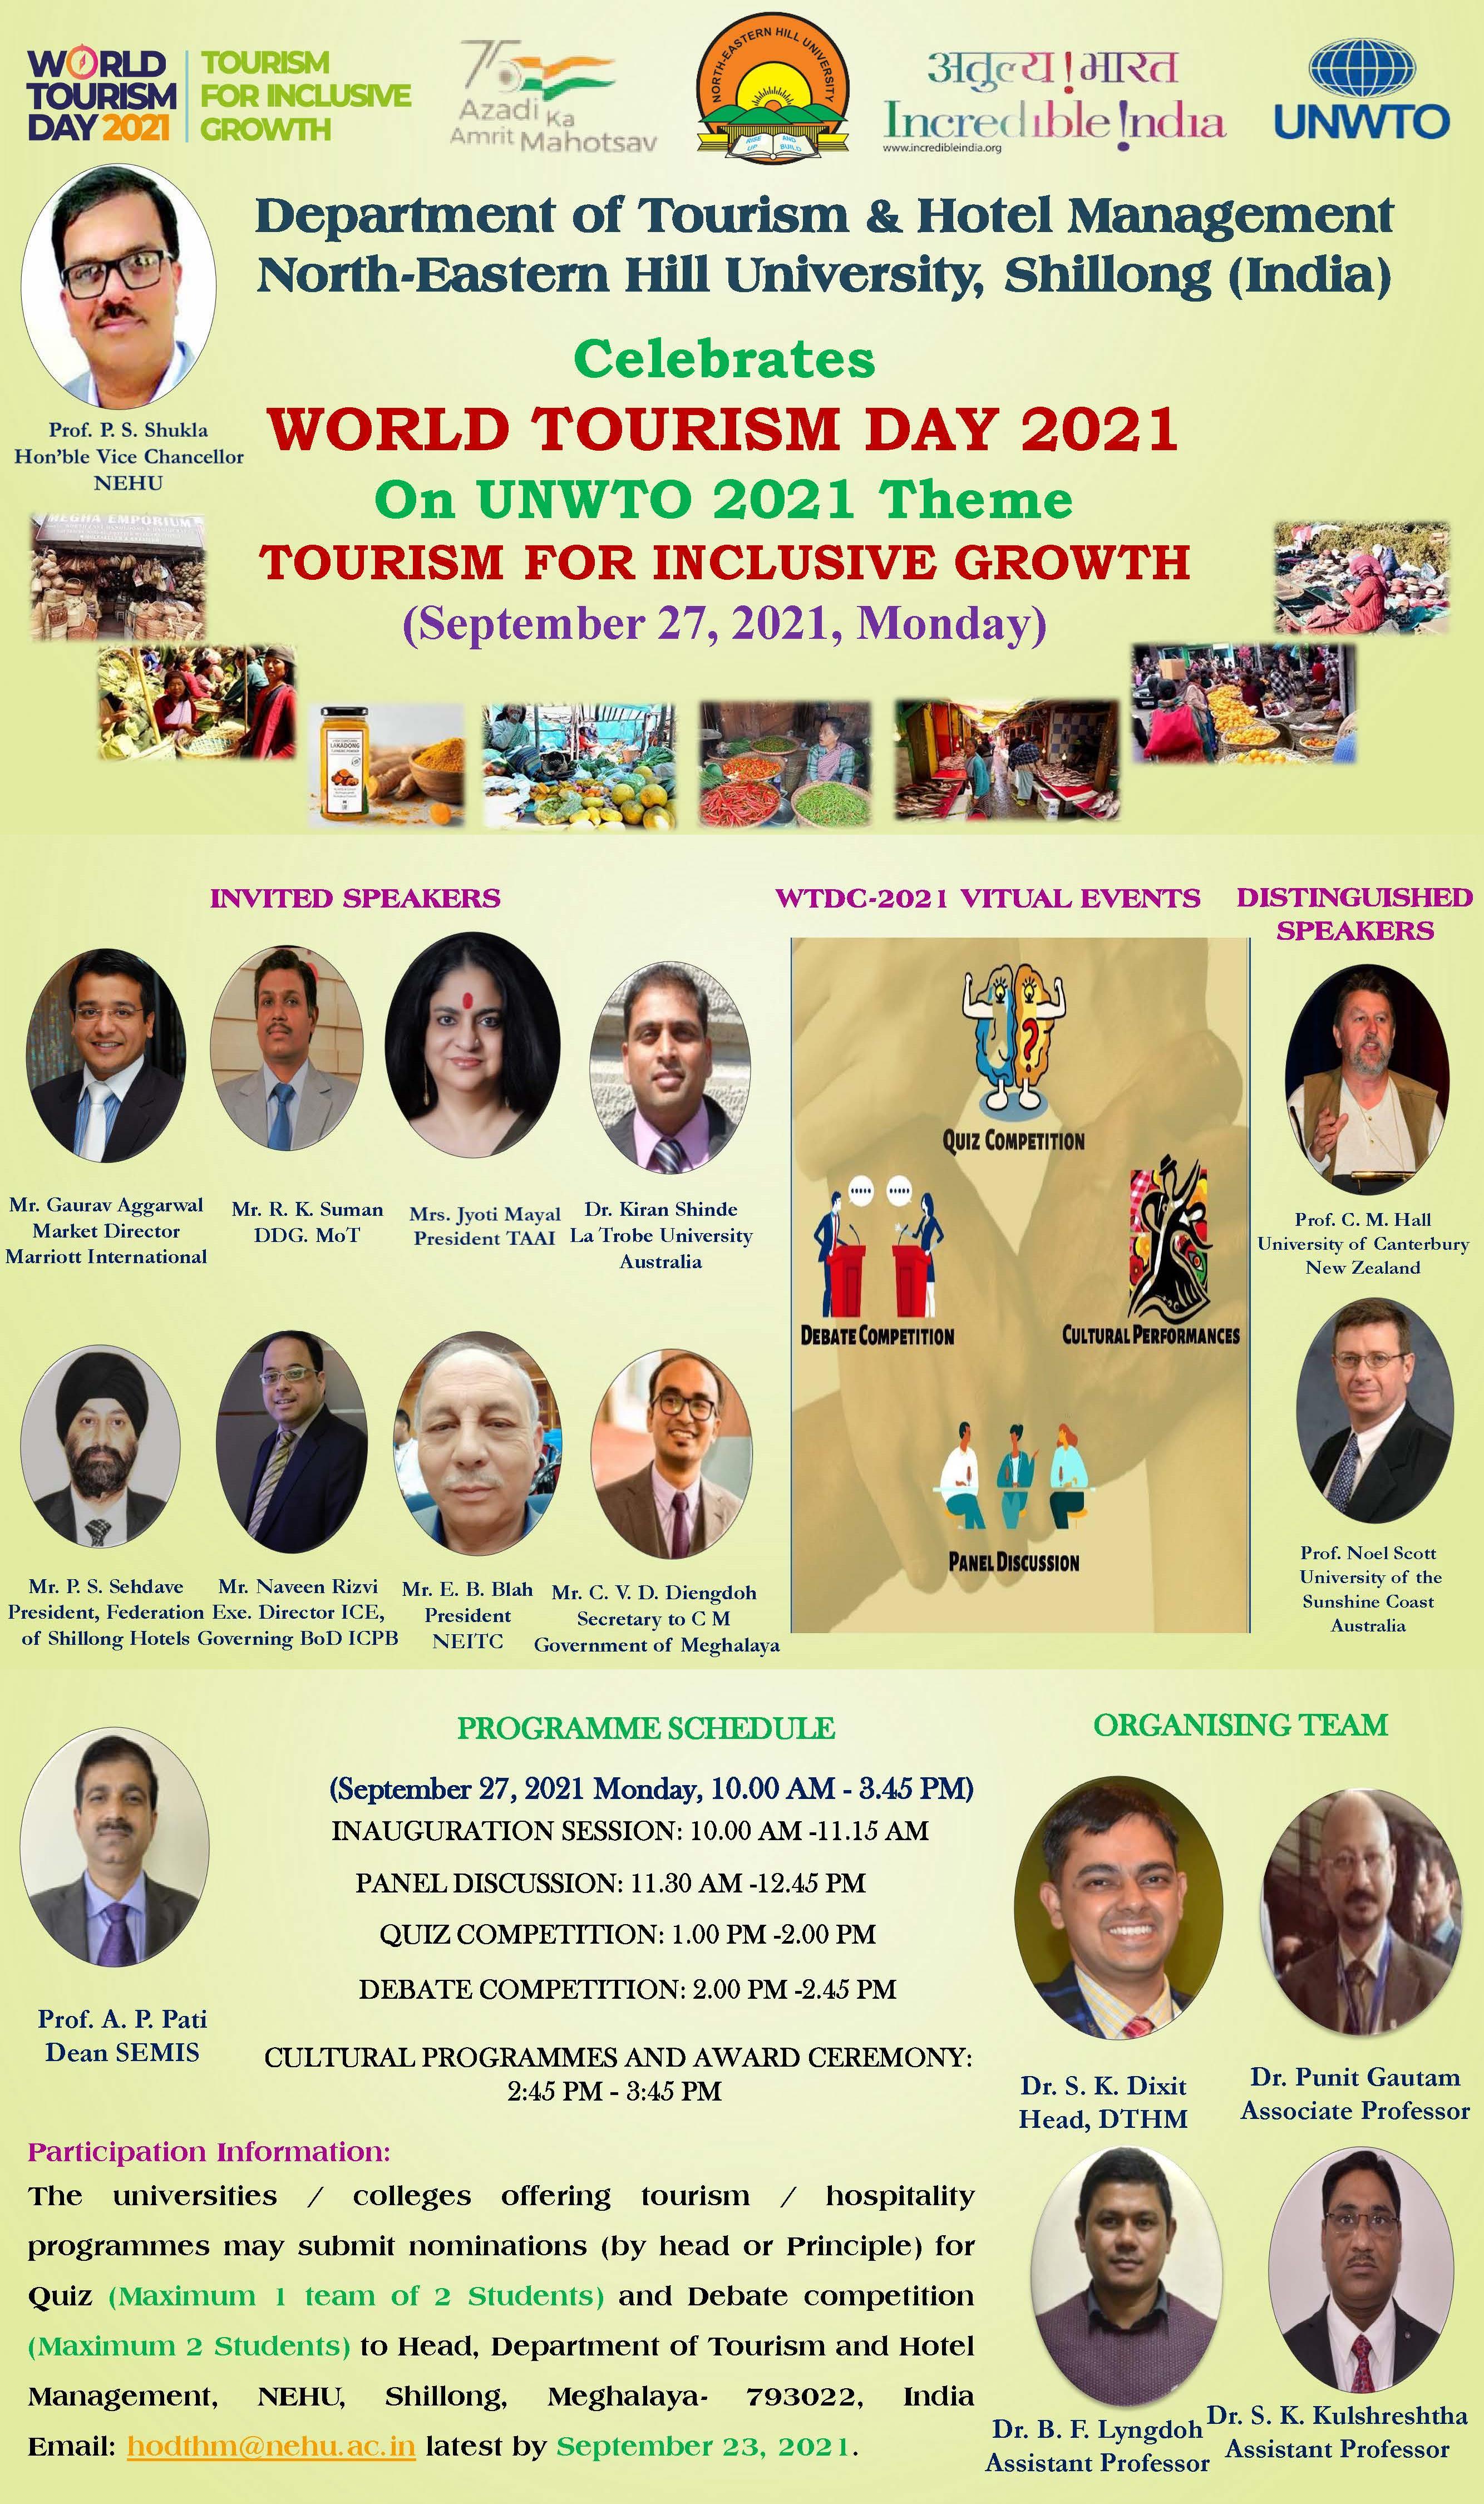 World Tourism Day 2021 on September 27